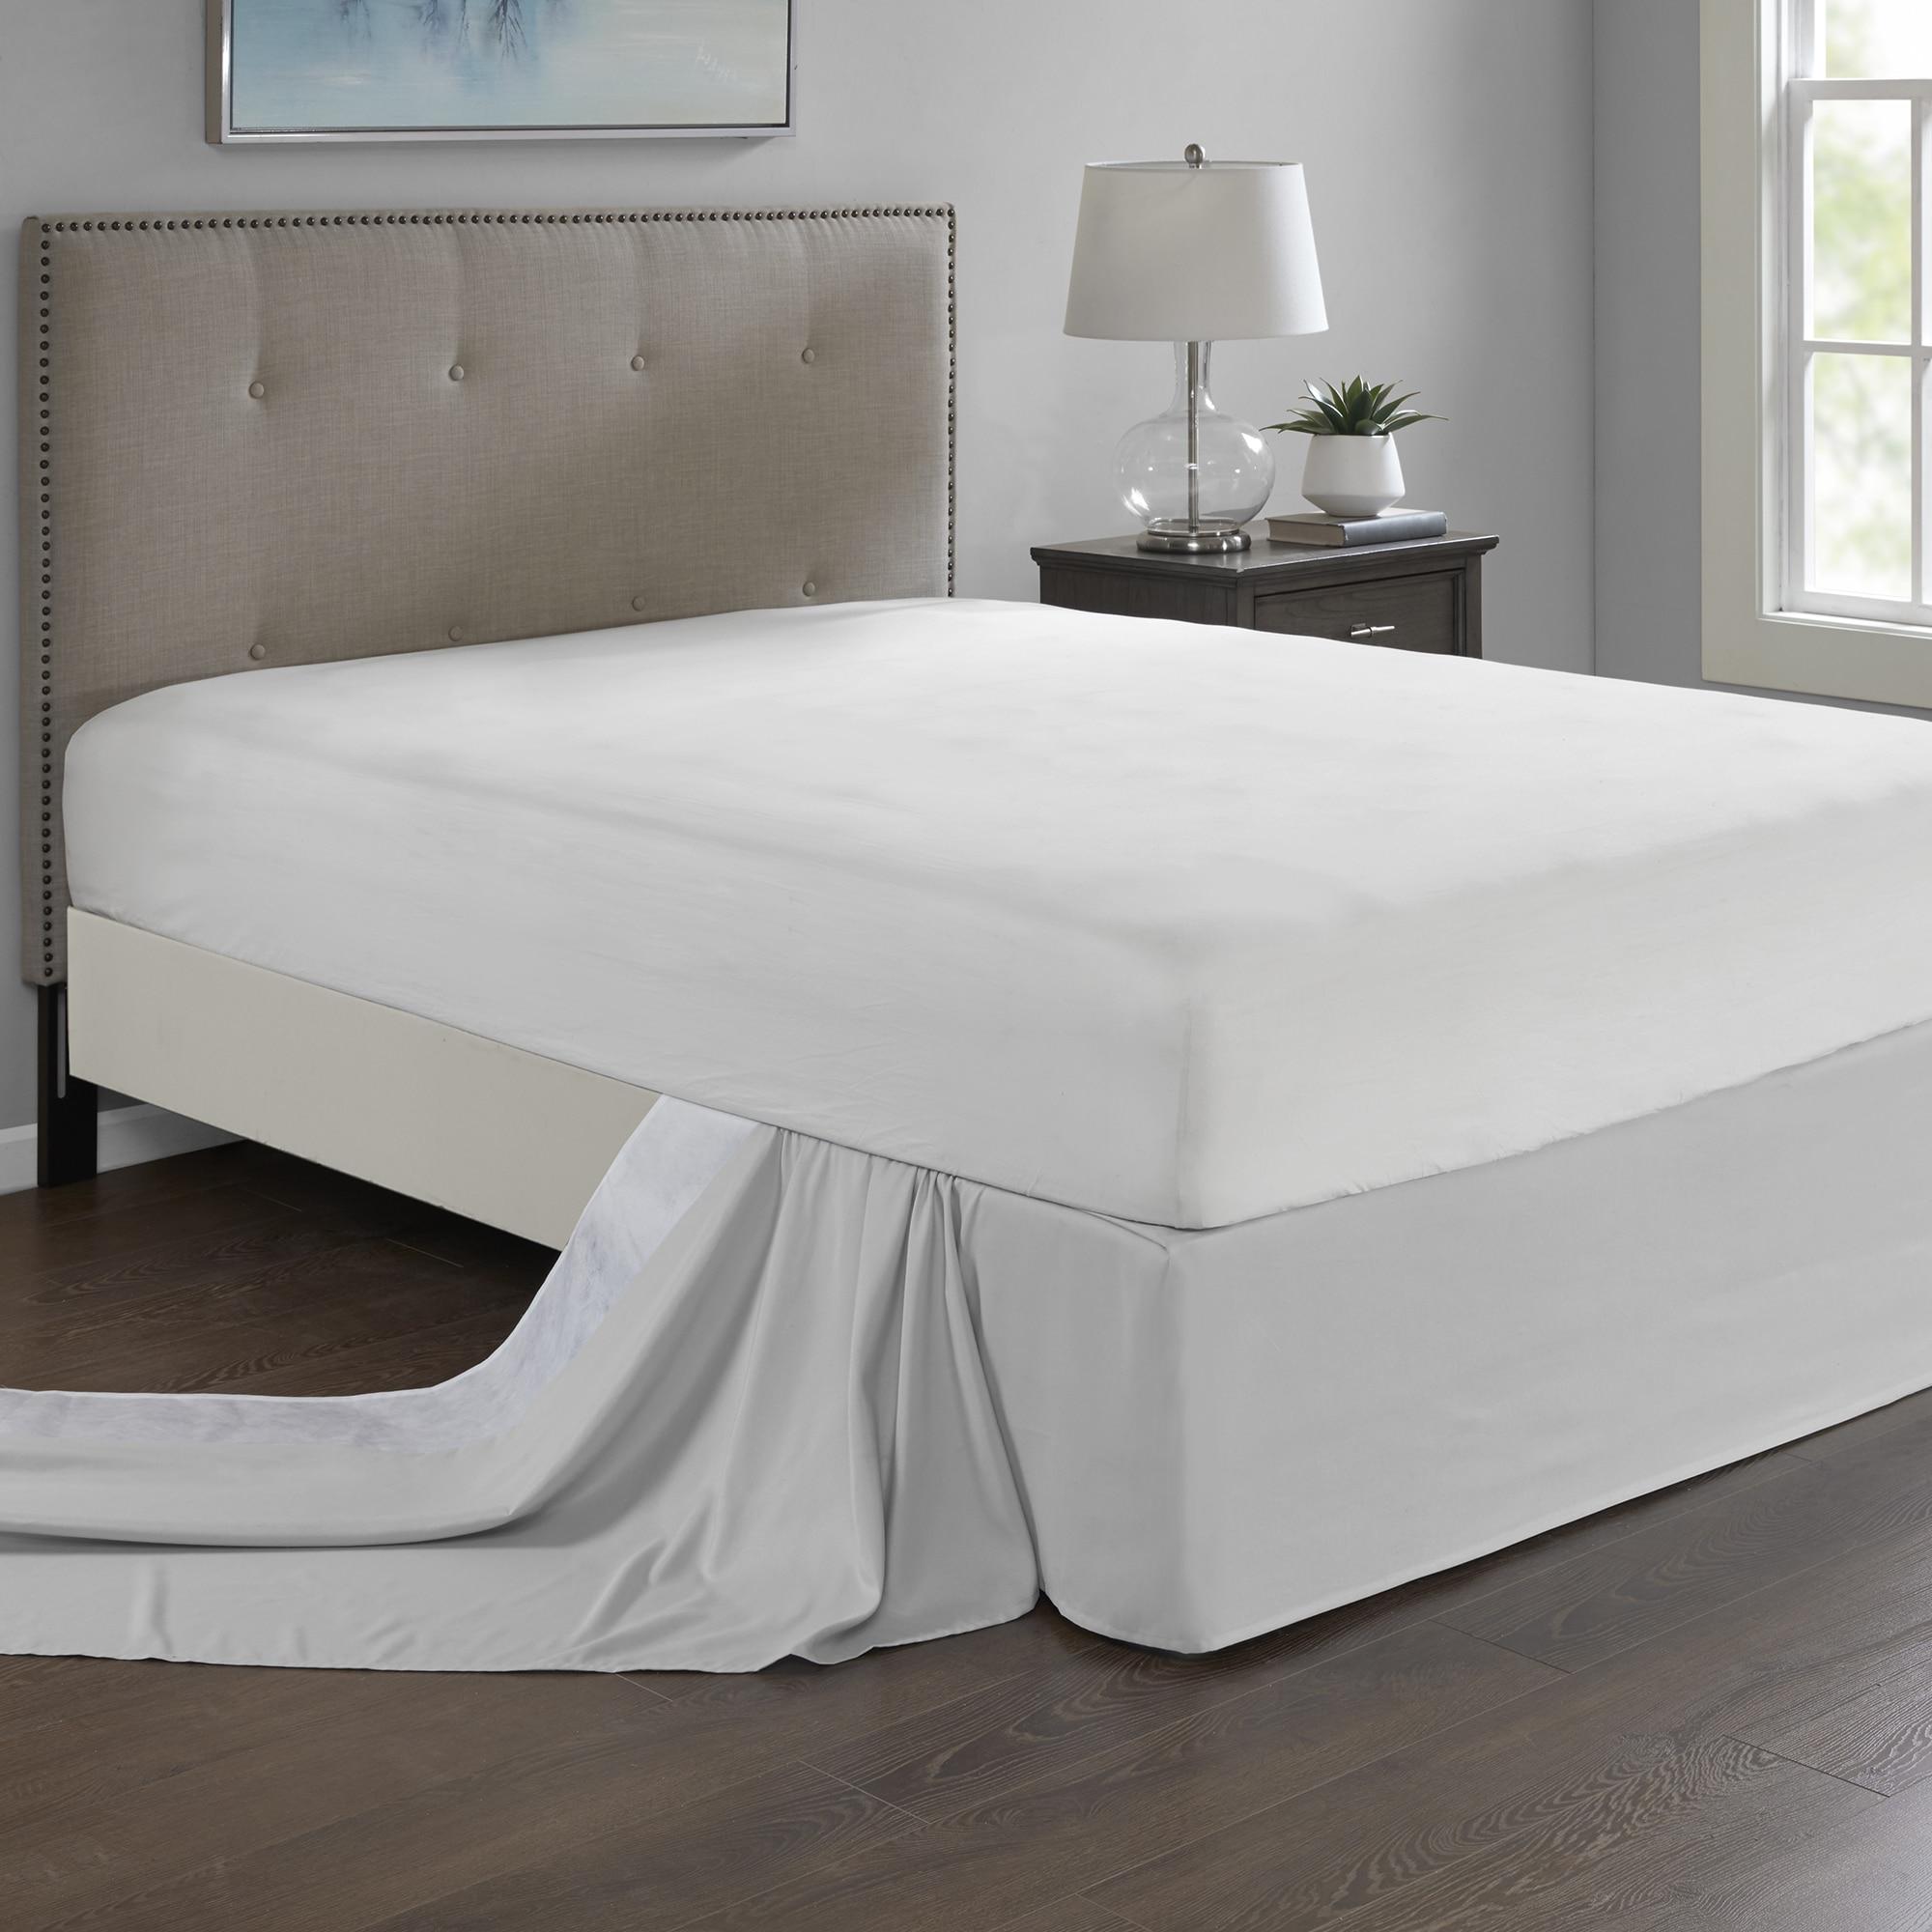 Shop Madison Park Simple Fit Wrap Around Adjustable 26 Inch Drop Bedskirt 5 Color Option